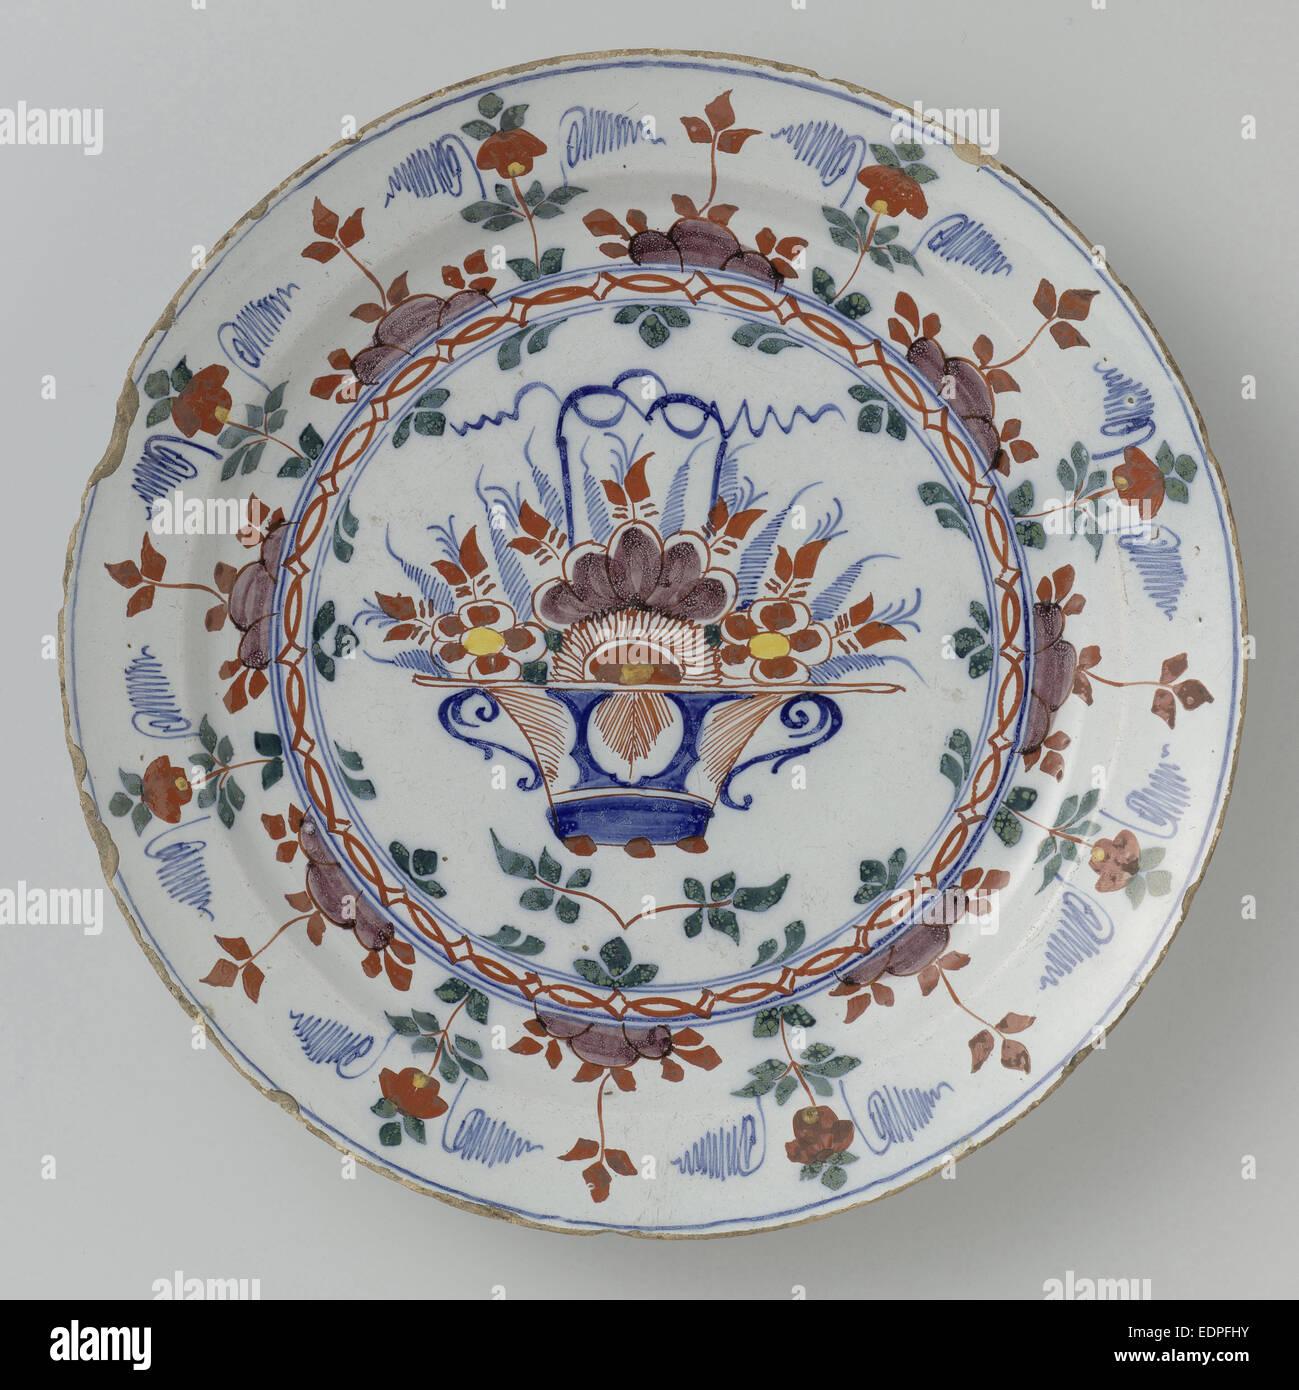 Dish polychrome faience, Anonymous, c. 1760 - c. 1790 - Stock Image